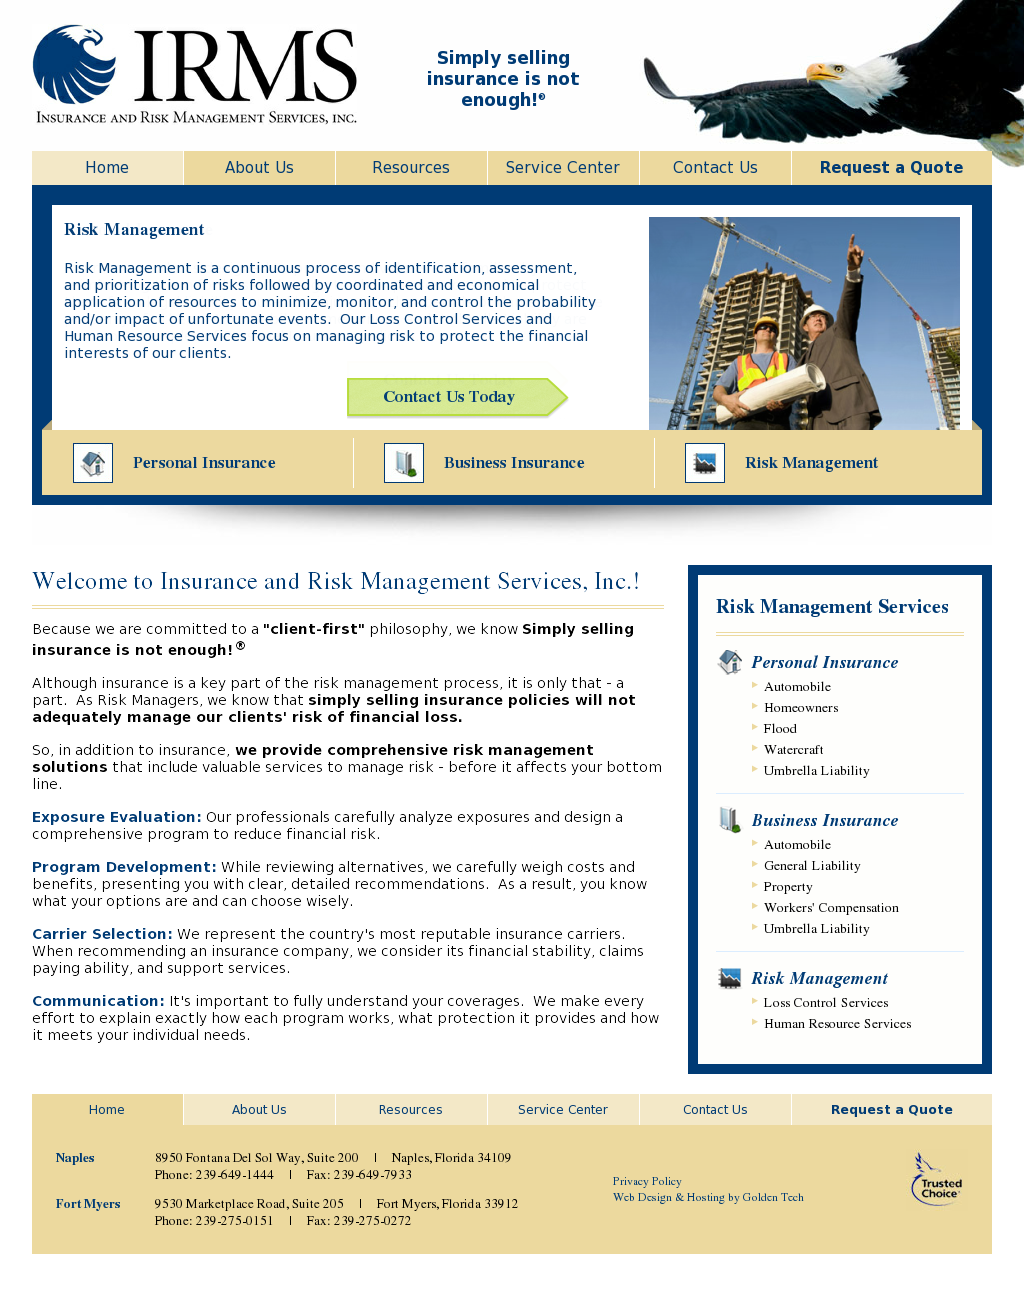 Insurance and Risk Management Services Competitors, Revenue